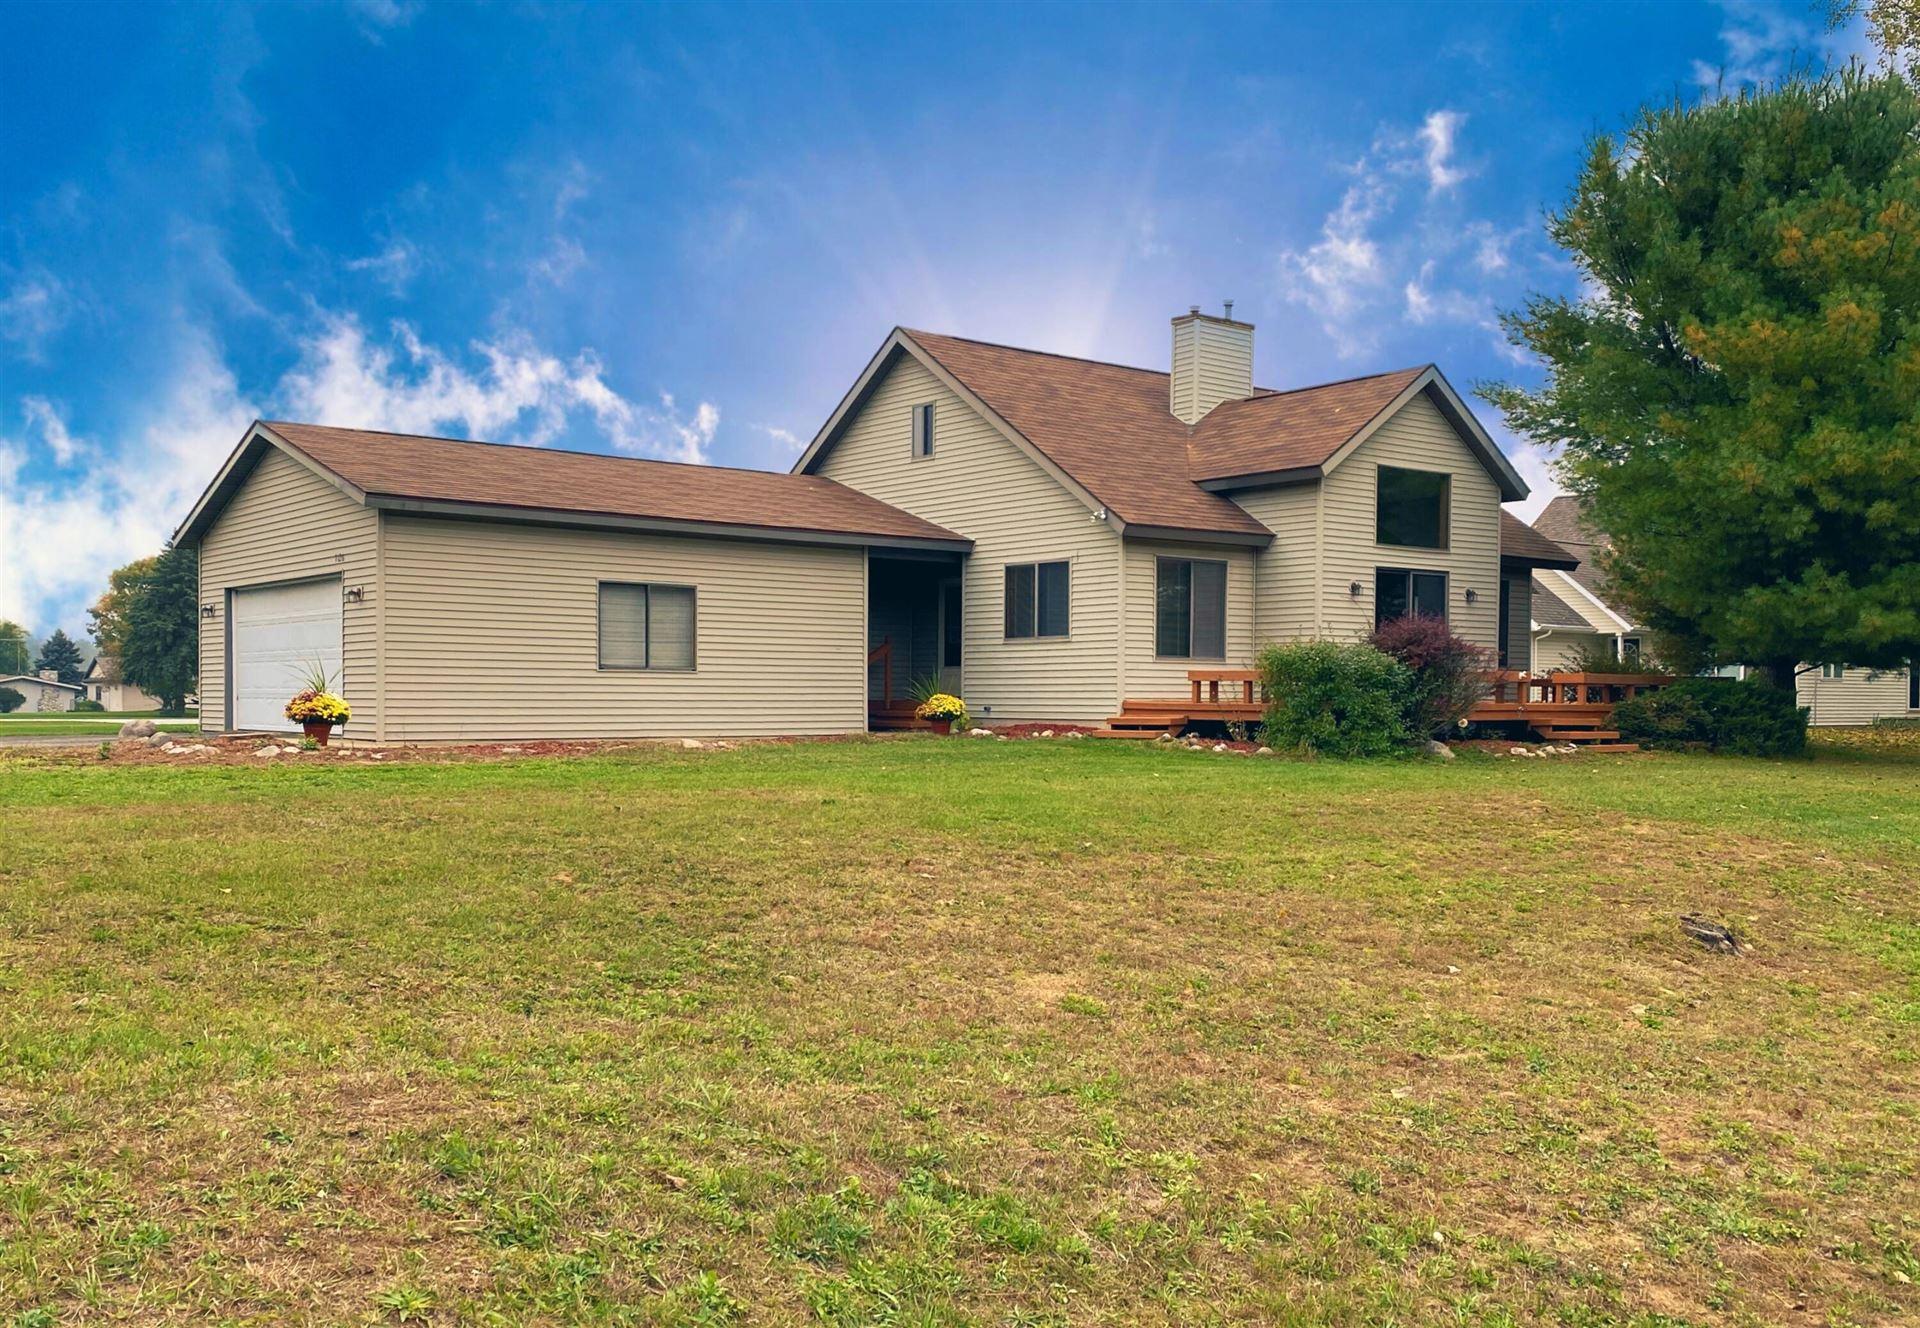 7126 Holiday Drive, Canadian Lakes, MI 49346 - MLS#: 21109674